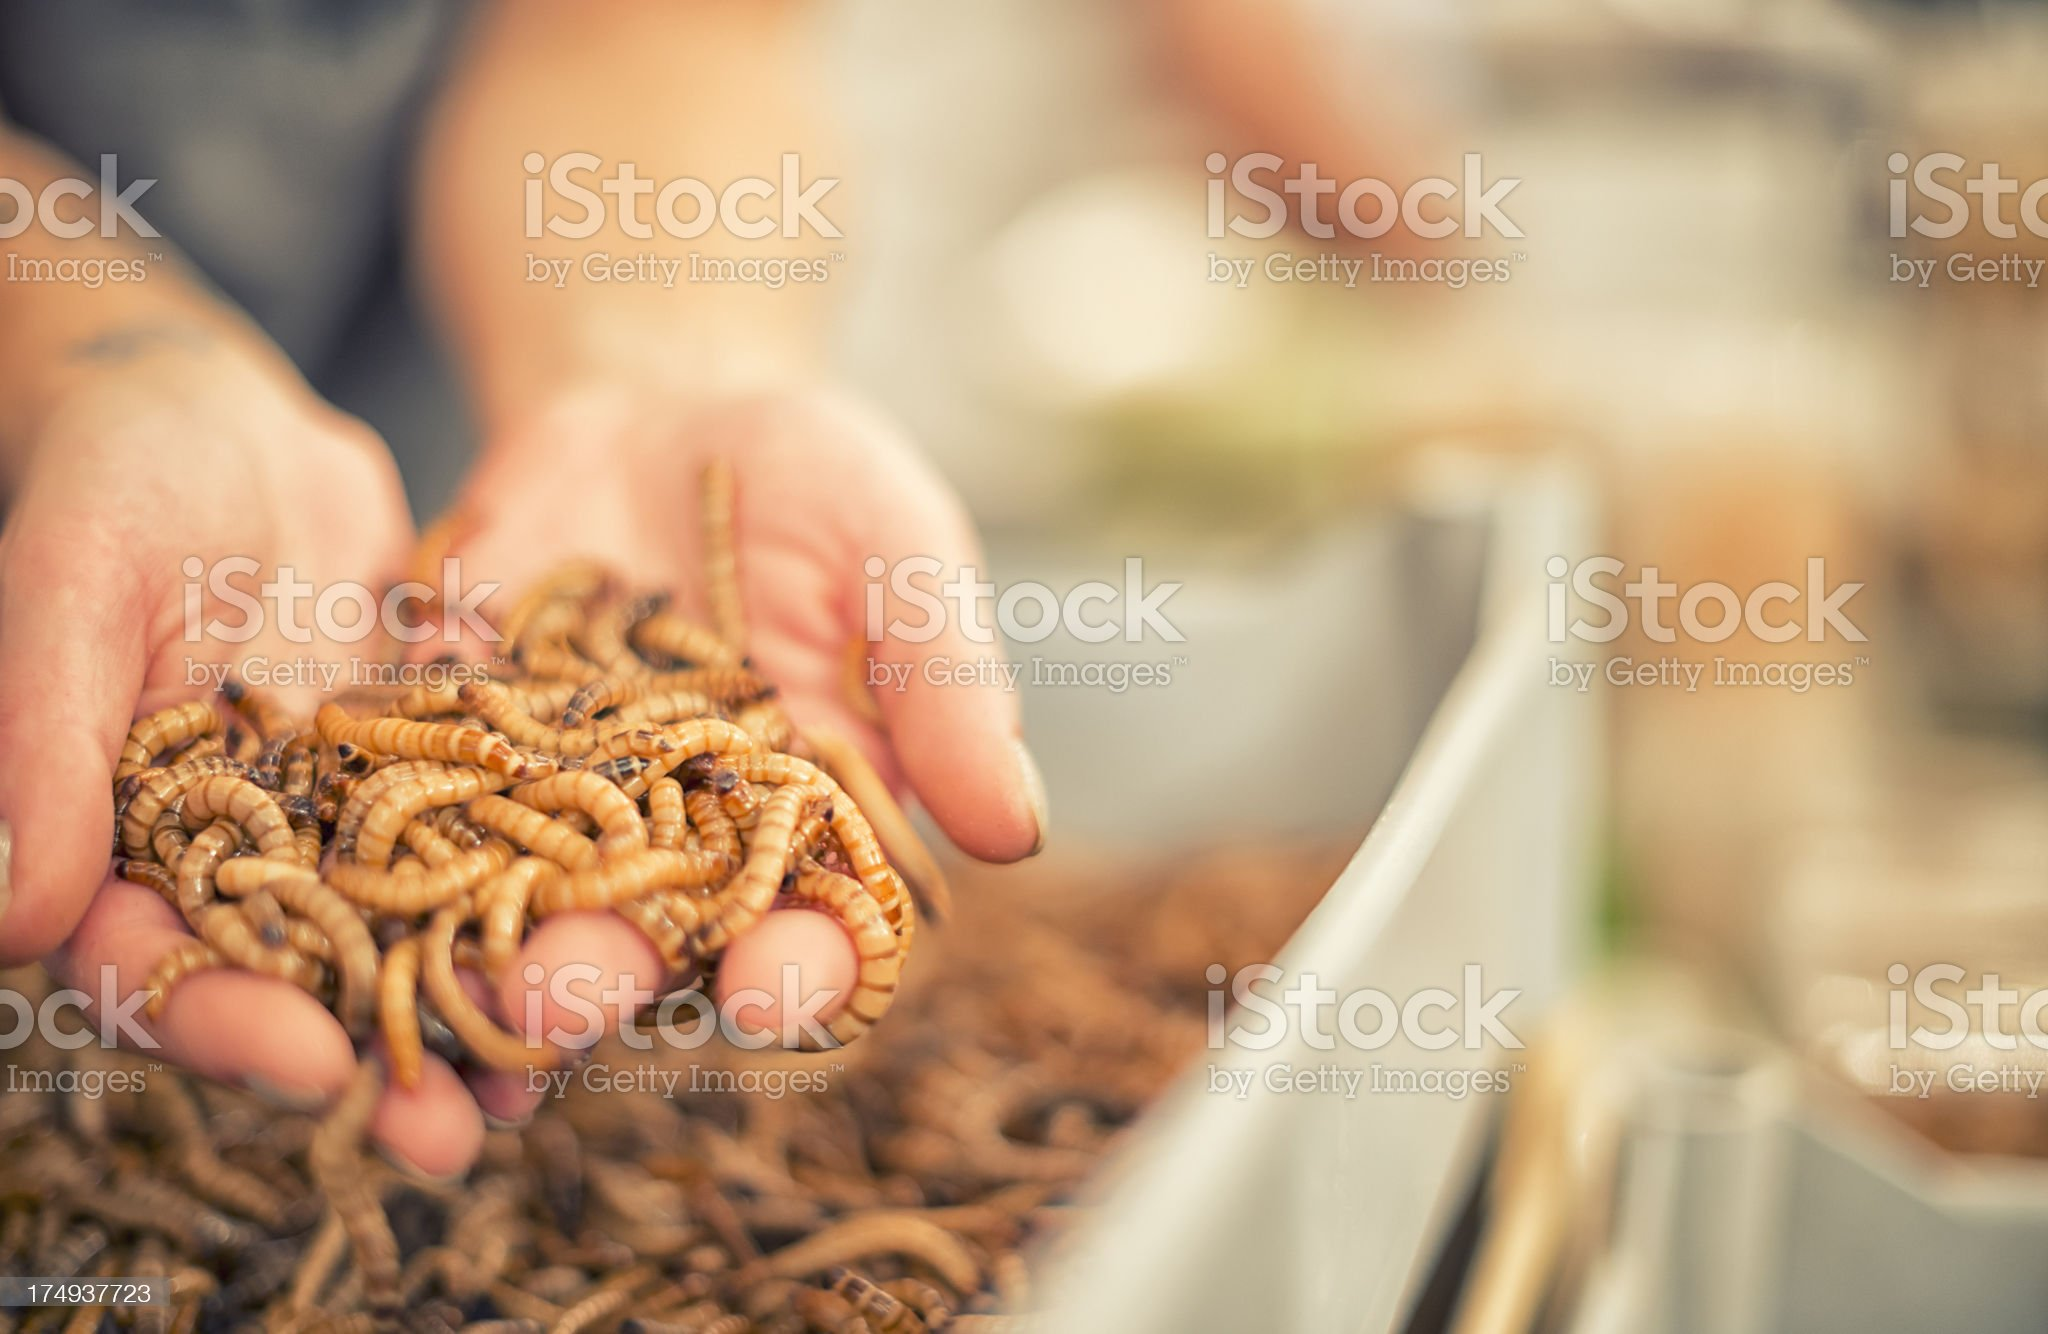 Zophobas, larvae, Superworm royalty-free stock photo